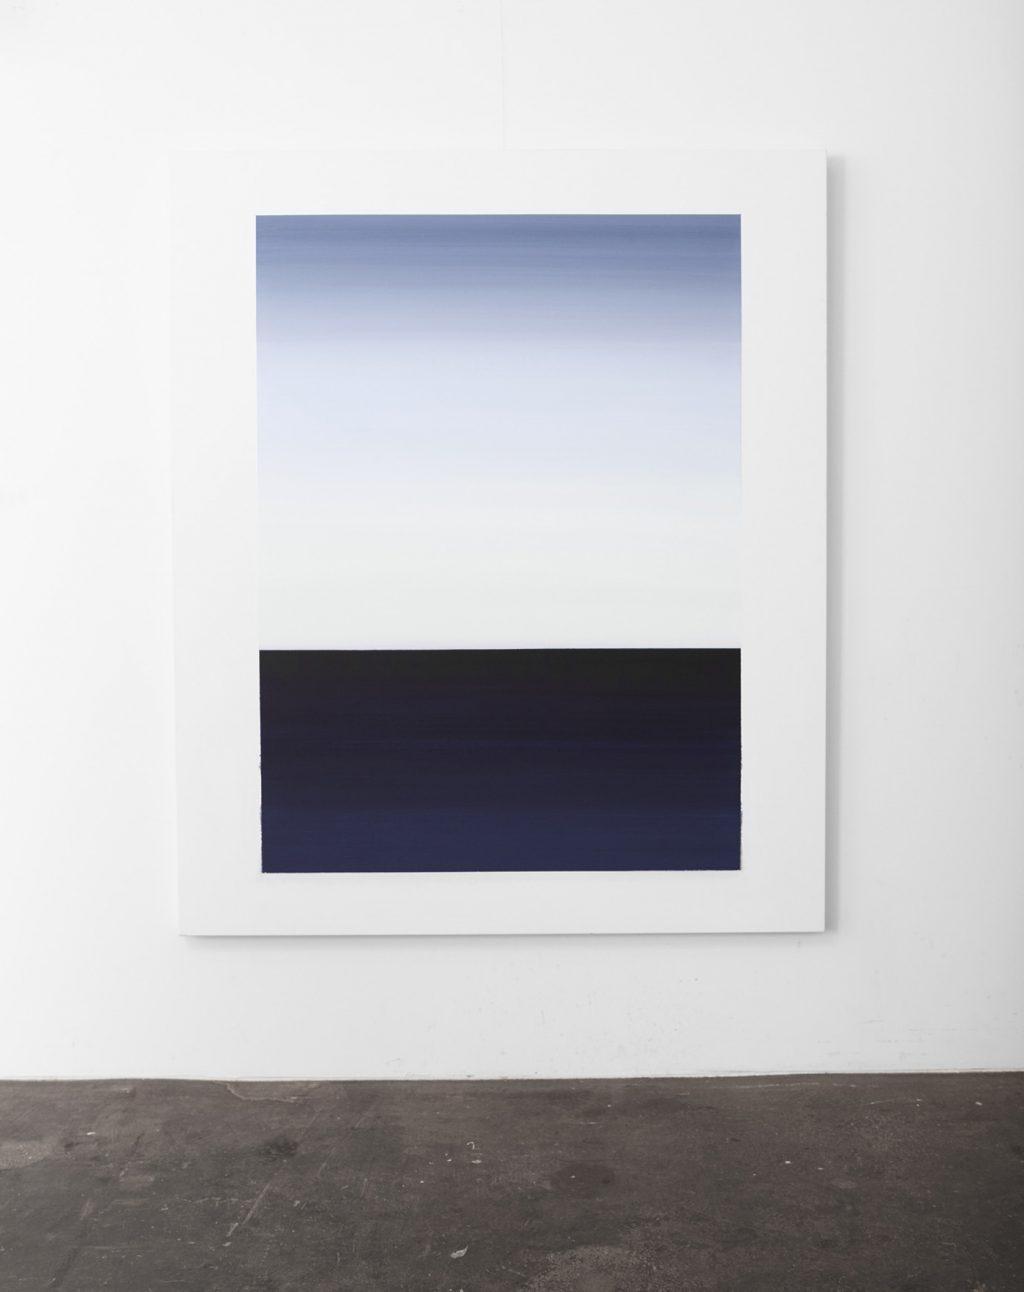 Untitled #39 – 2015